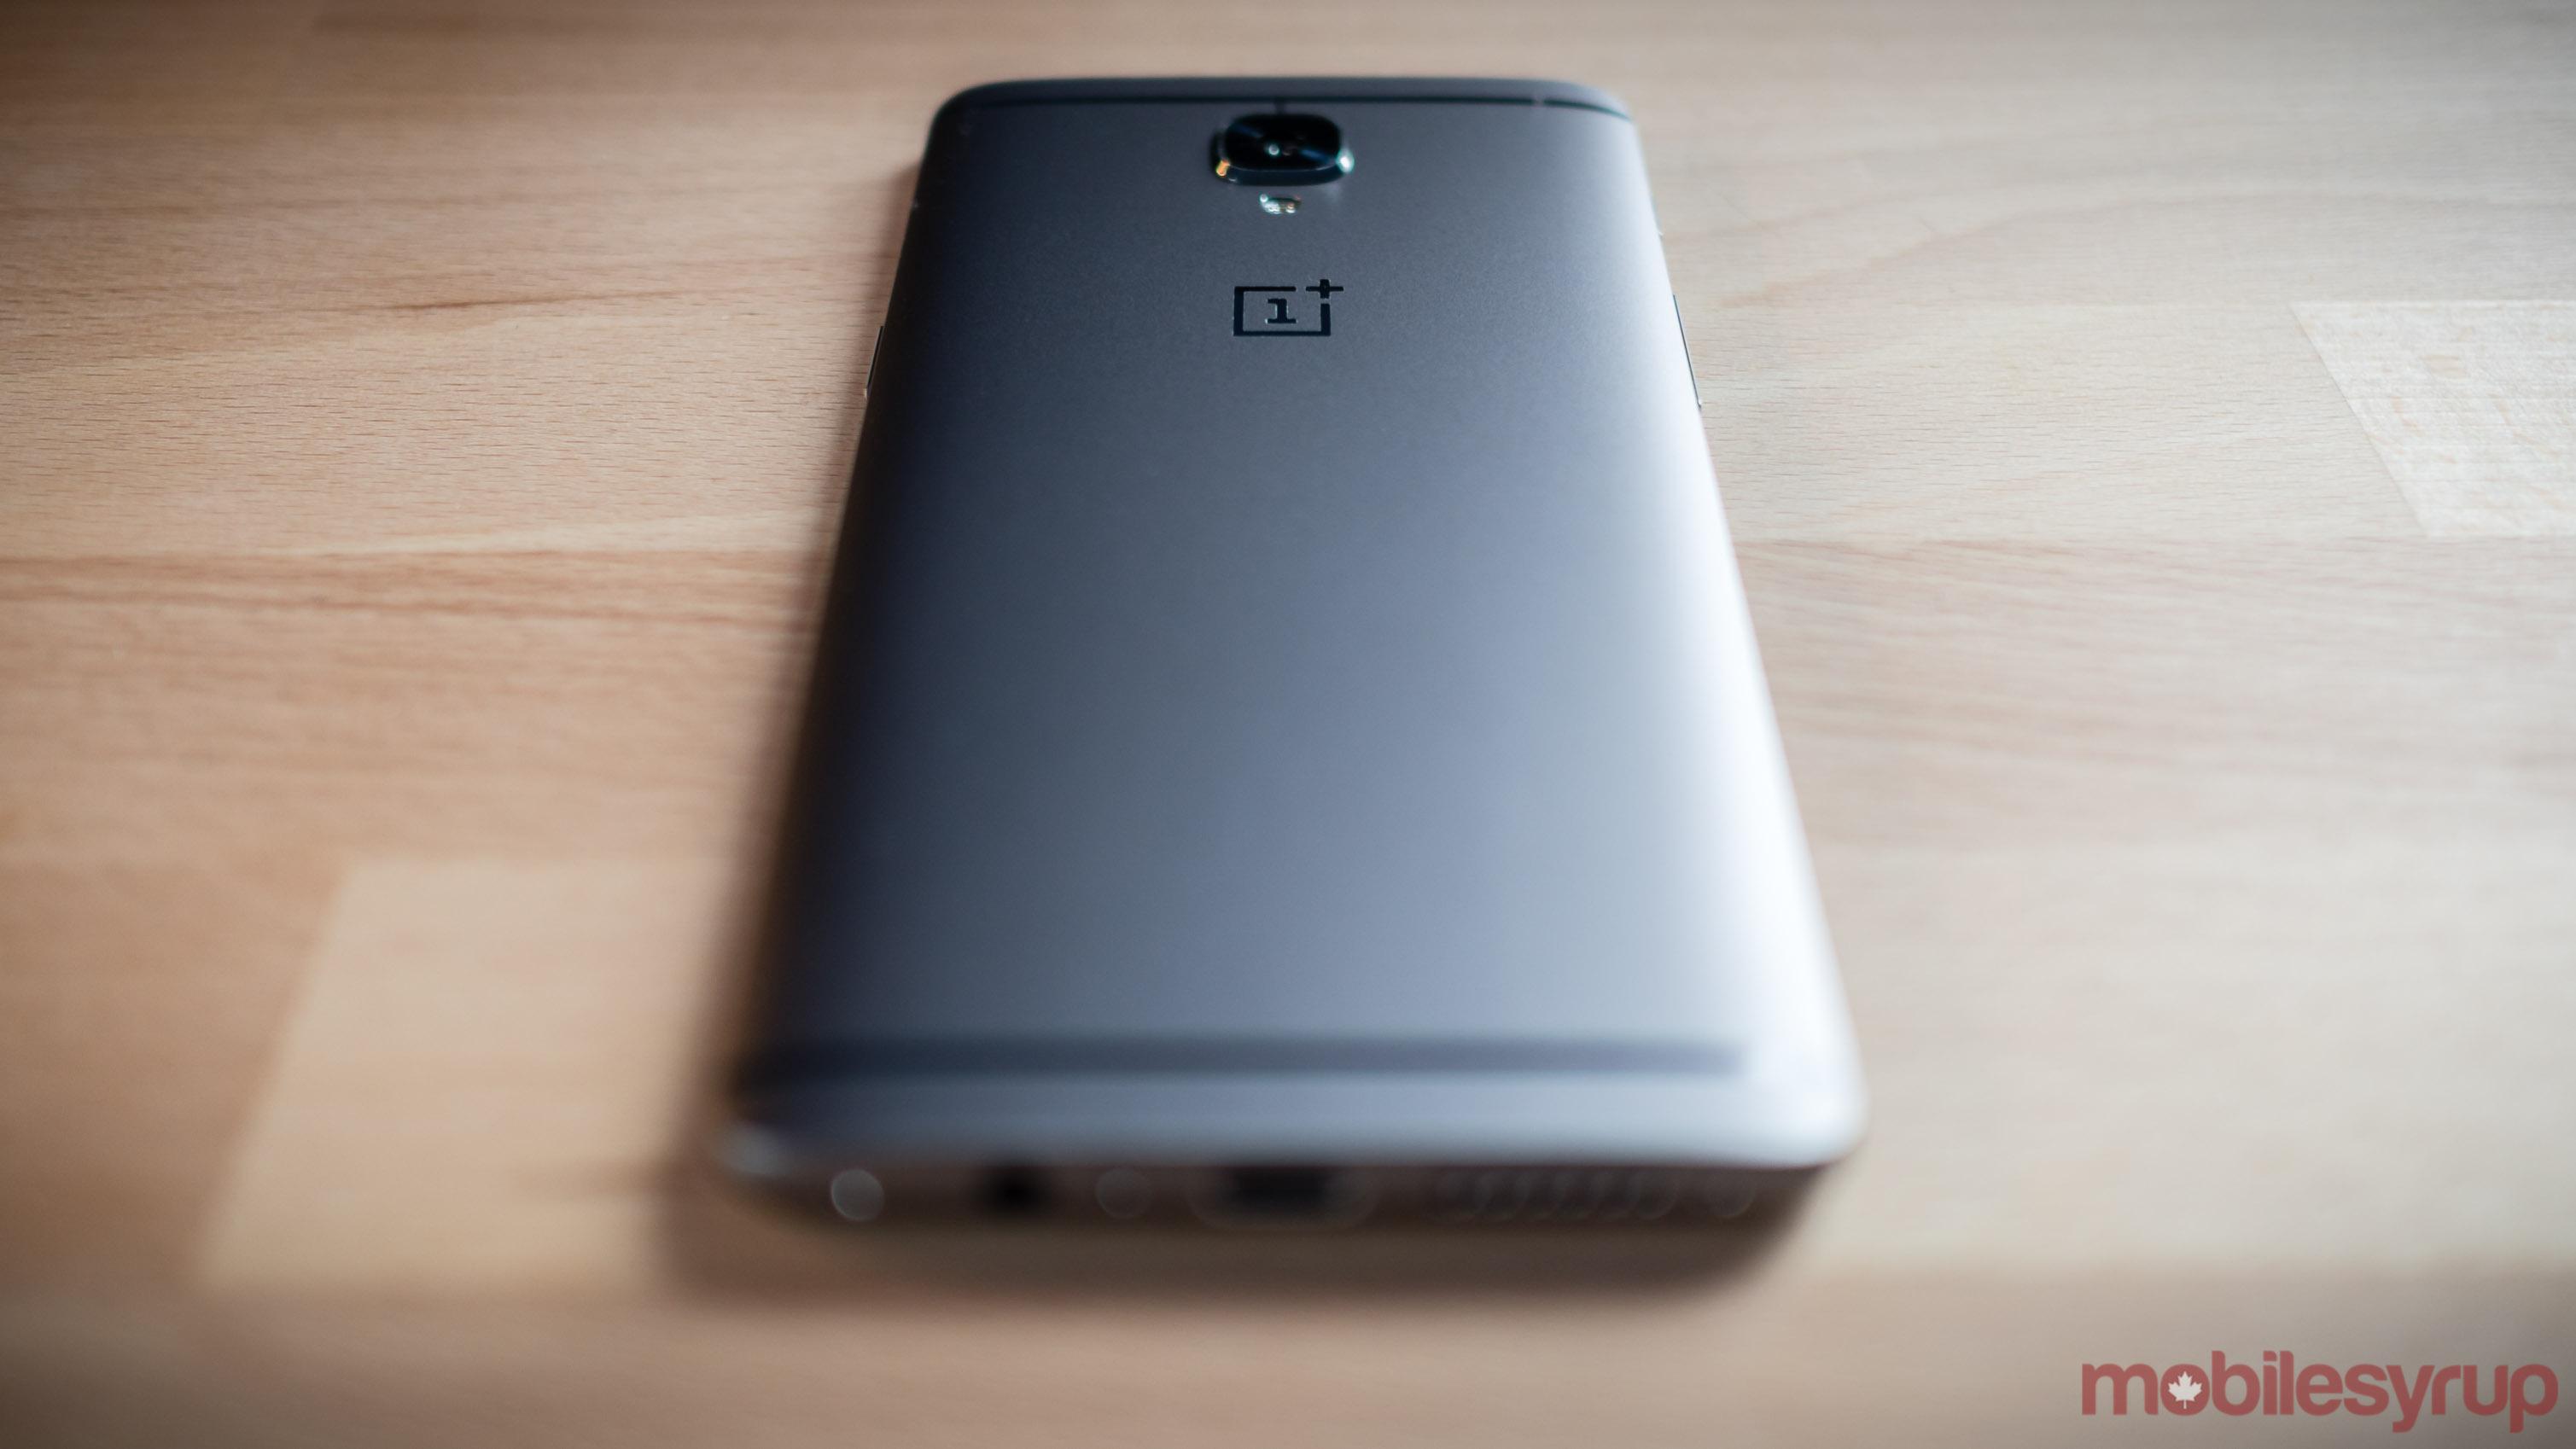 OnePlus 3T smartphone - OnePlus 4